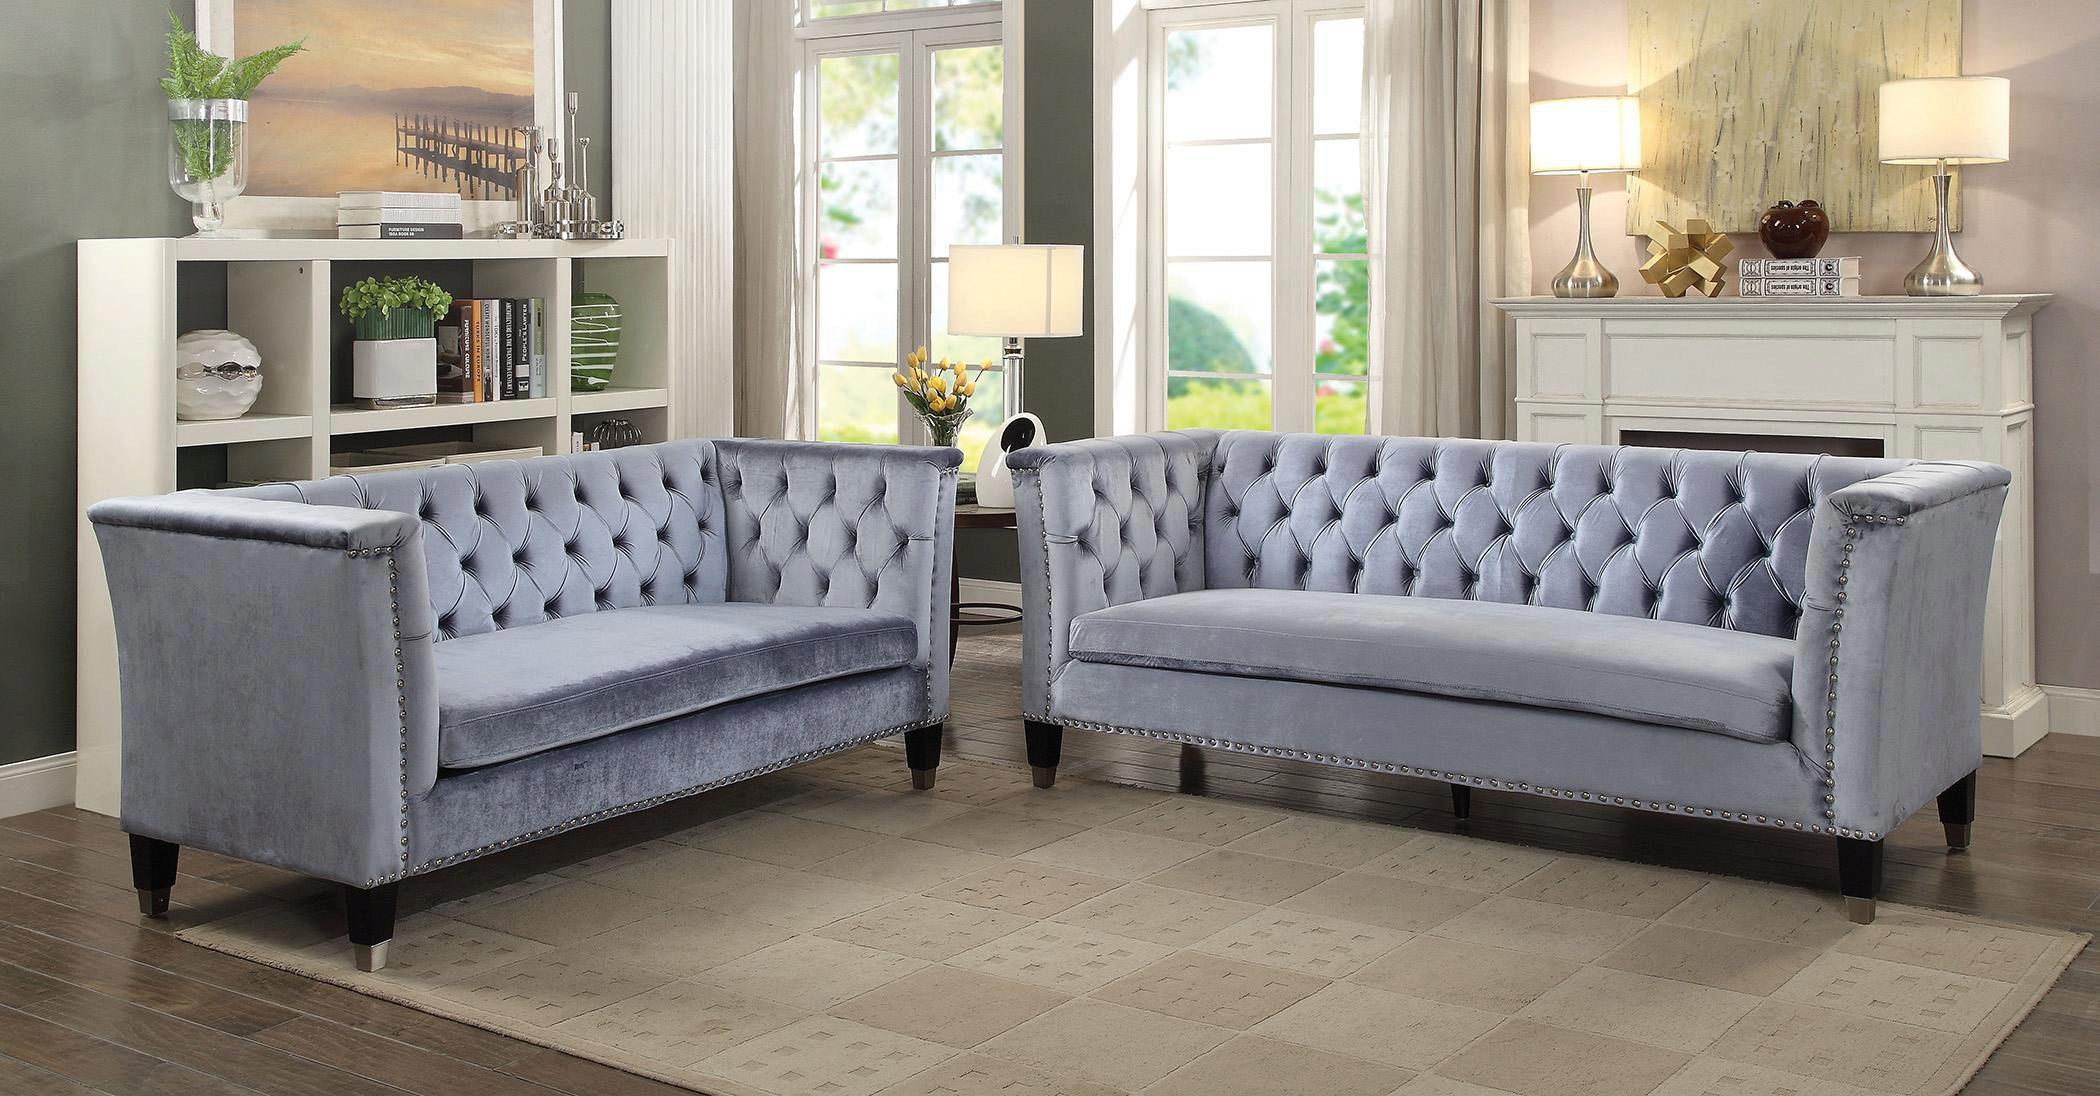 Blue Grey Velvet Tufted Sofa Set 2 Pcs Vintage Traditional Acme 52785 Honor Honor 52785 Set 2